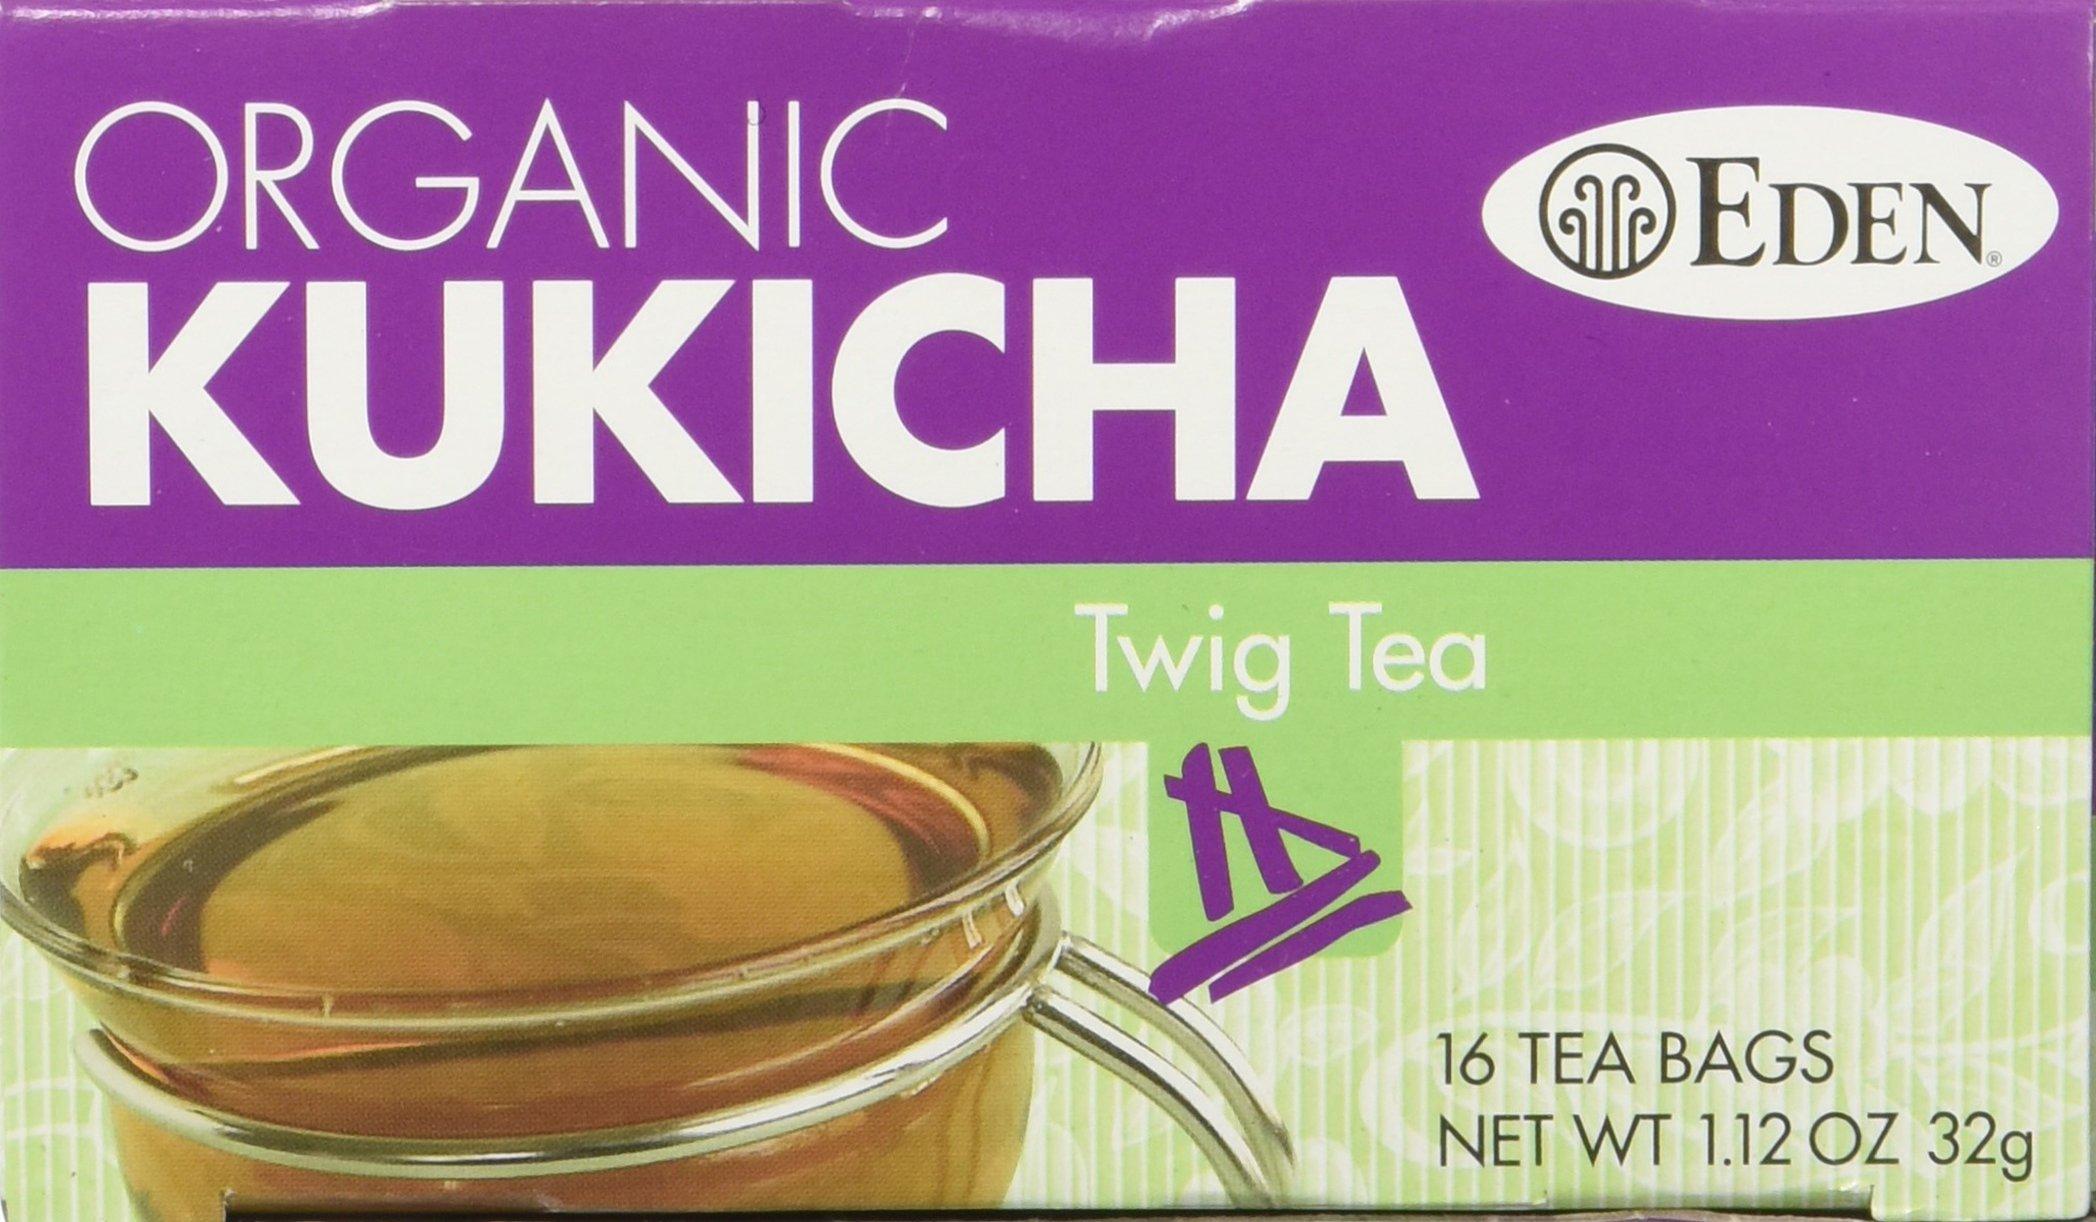 Eden Twig Tea, Tea Bags, Kukicha, Organic 1.12 oz Boxes